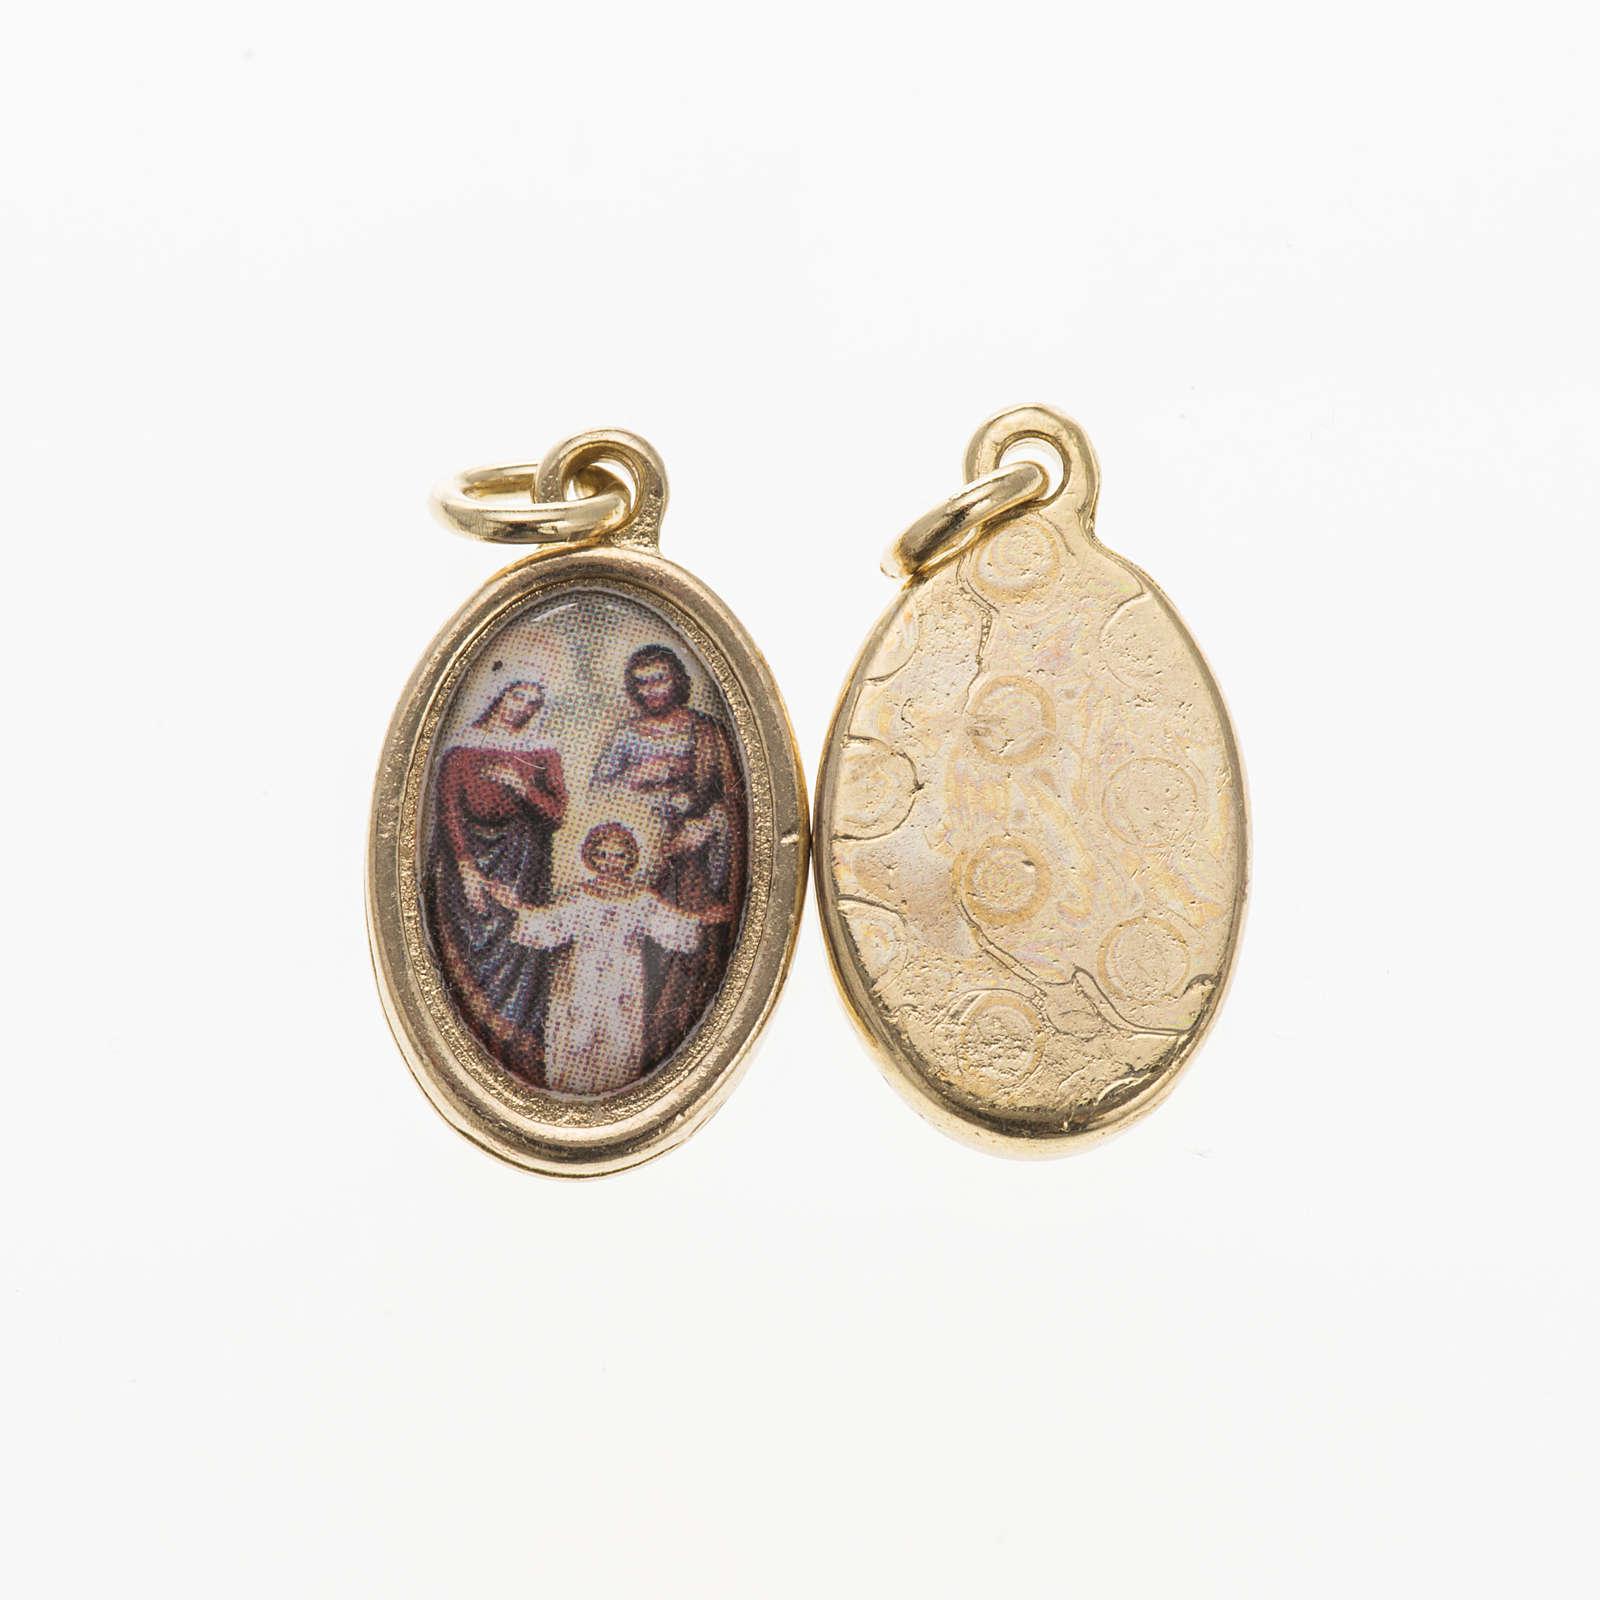 Medaglia Sacra Famiglia metallo dorato resina 1,5x1 cm 4